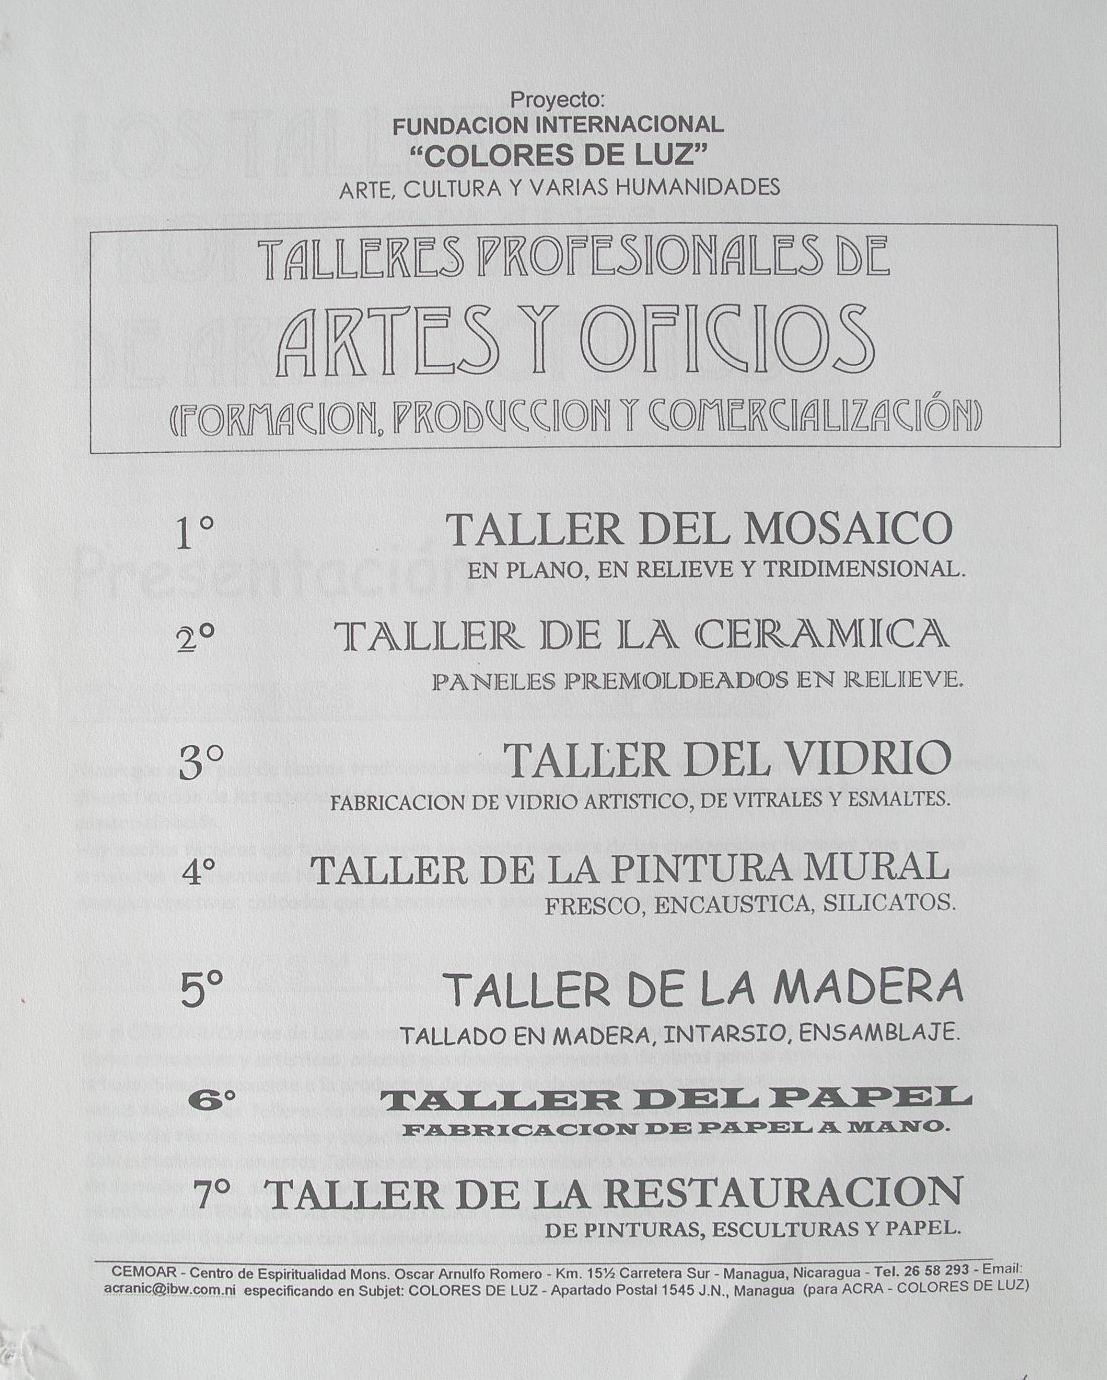 2001-1 Progetto Colores de Luz, Managua